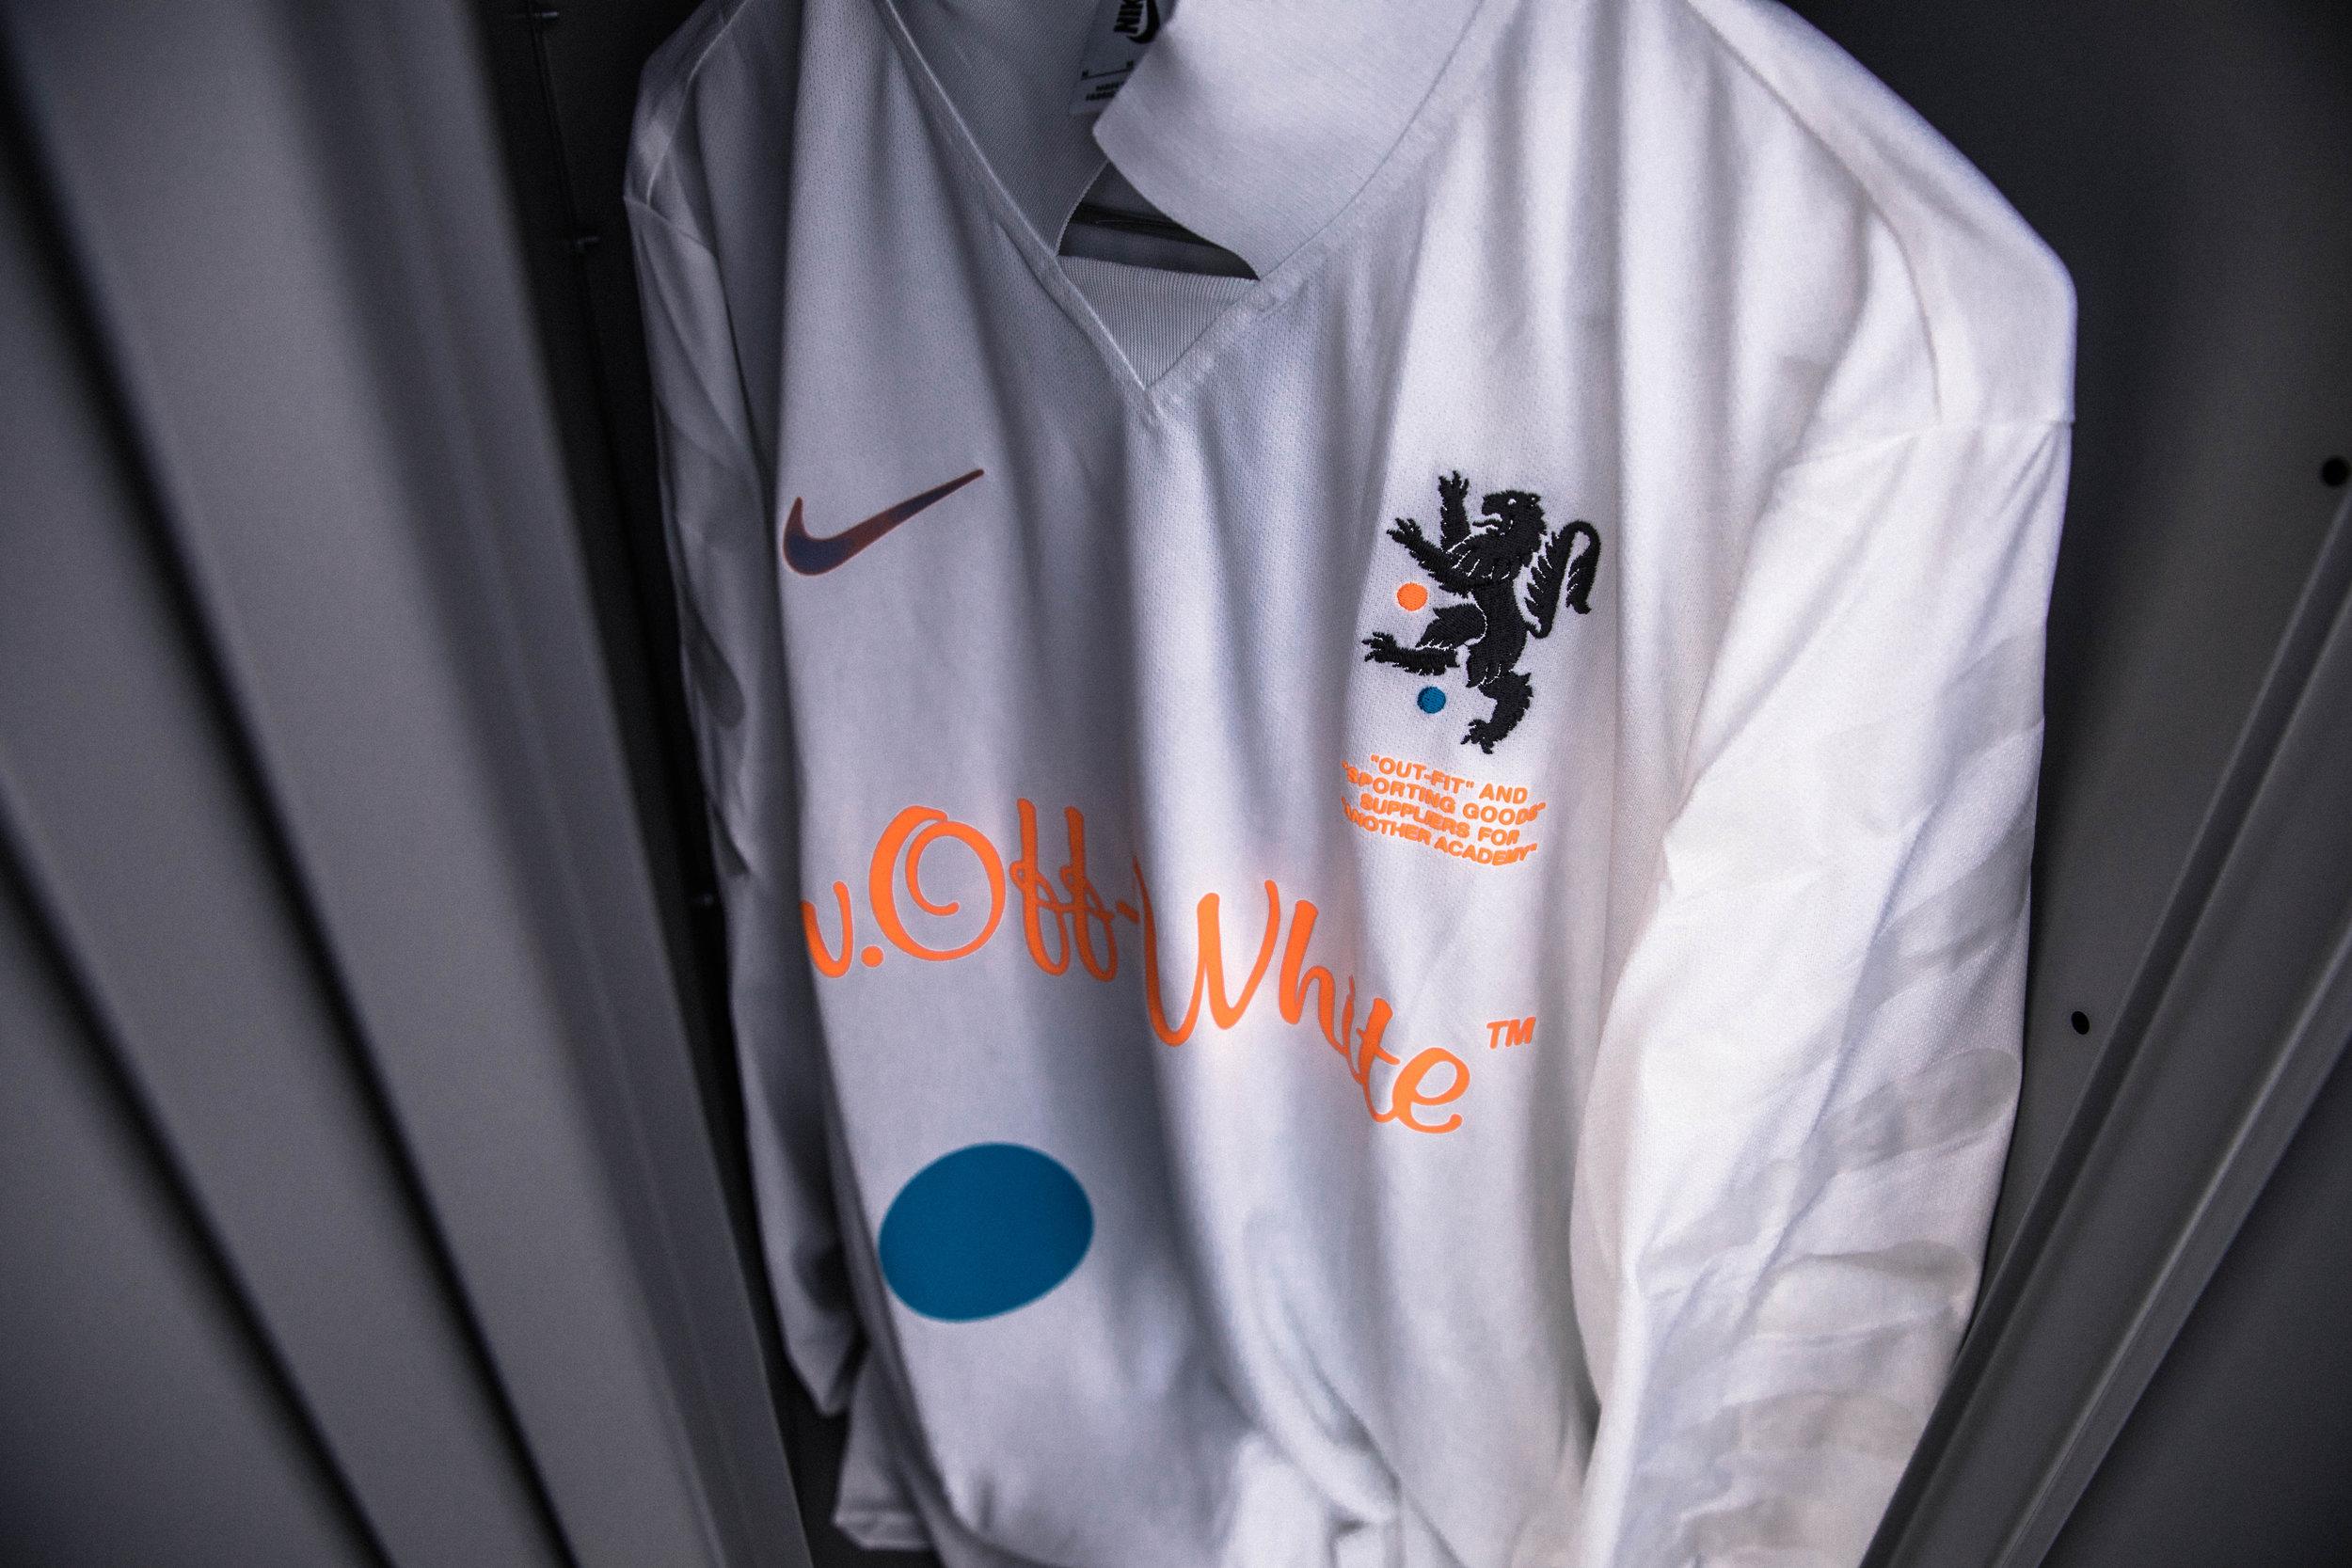 Football_Mon_Amour_Nike_NYC_7.jpg